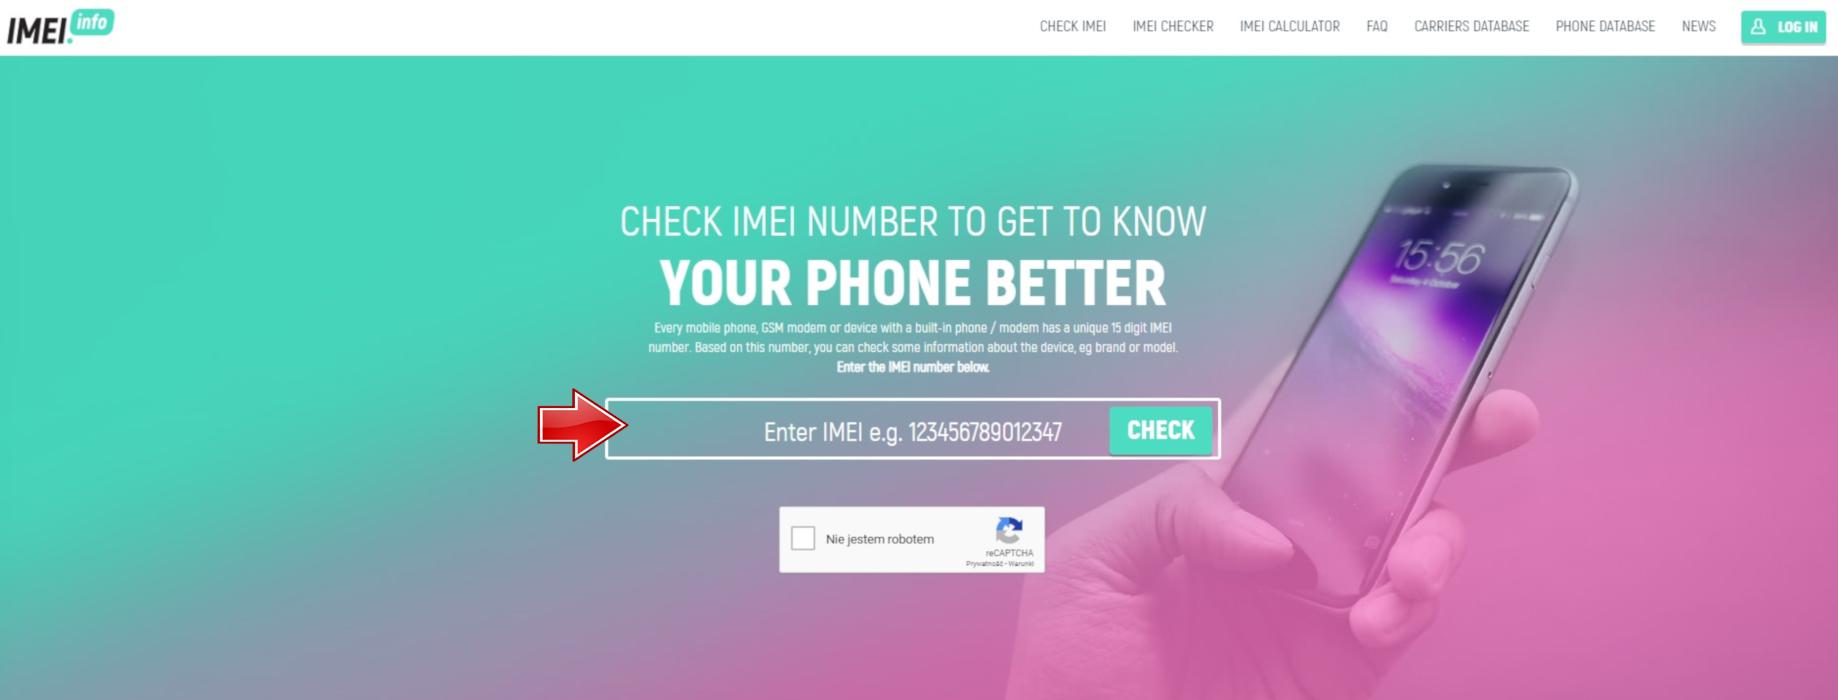 Huawei Warranty & SN Checker - News - IMEI info